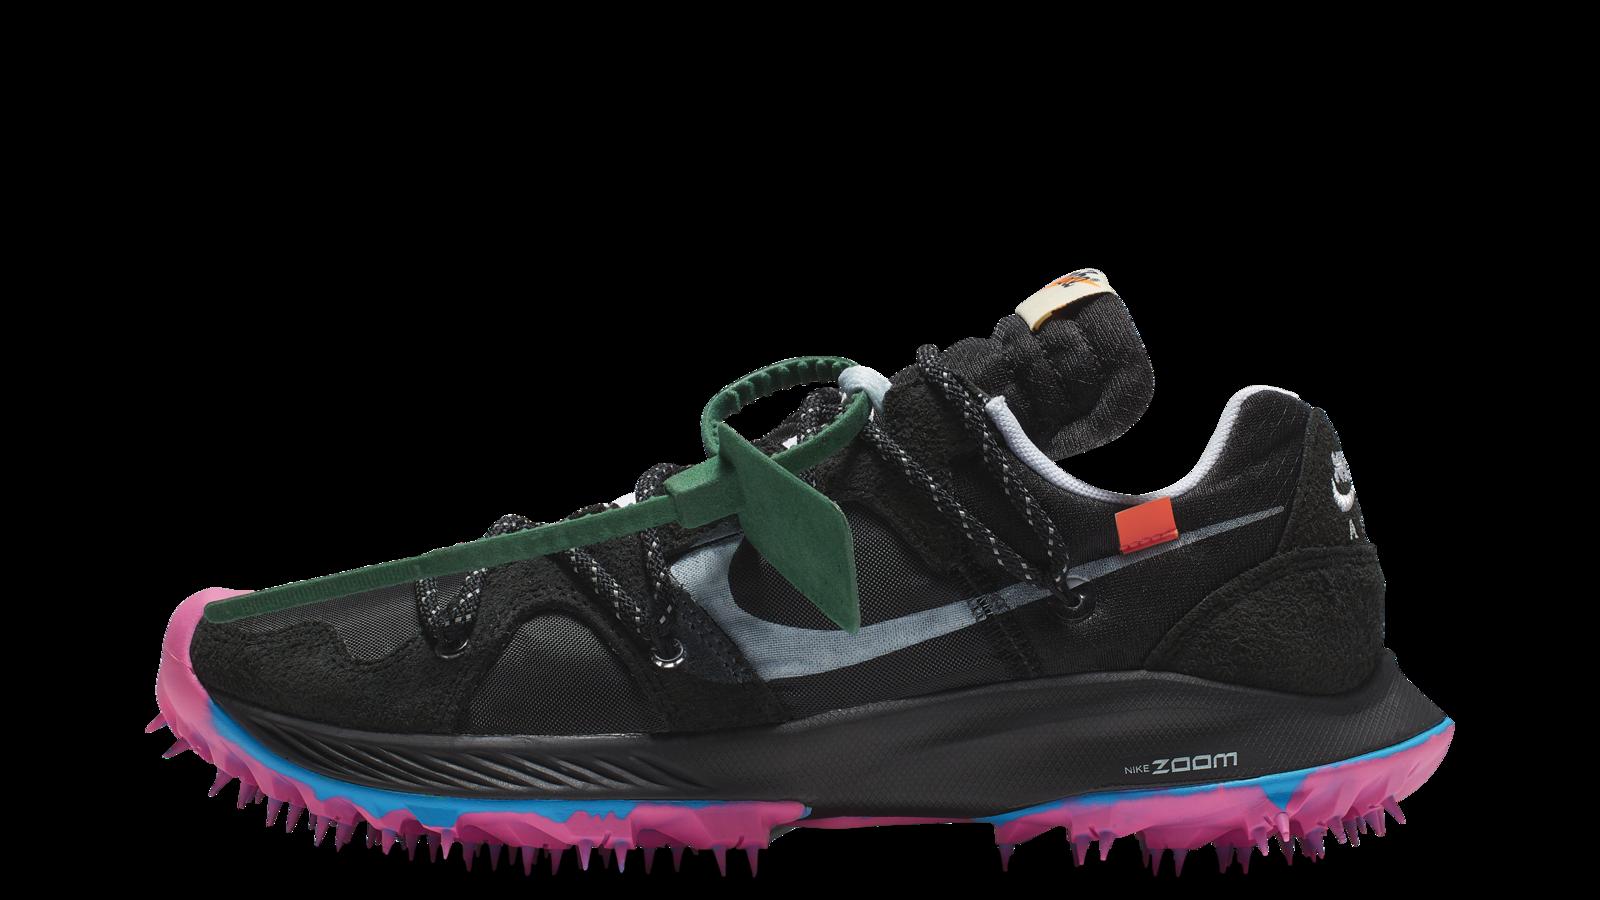 new styles d6875 b5d26 Nike x Off-White Zoom Terra Kiger 5